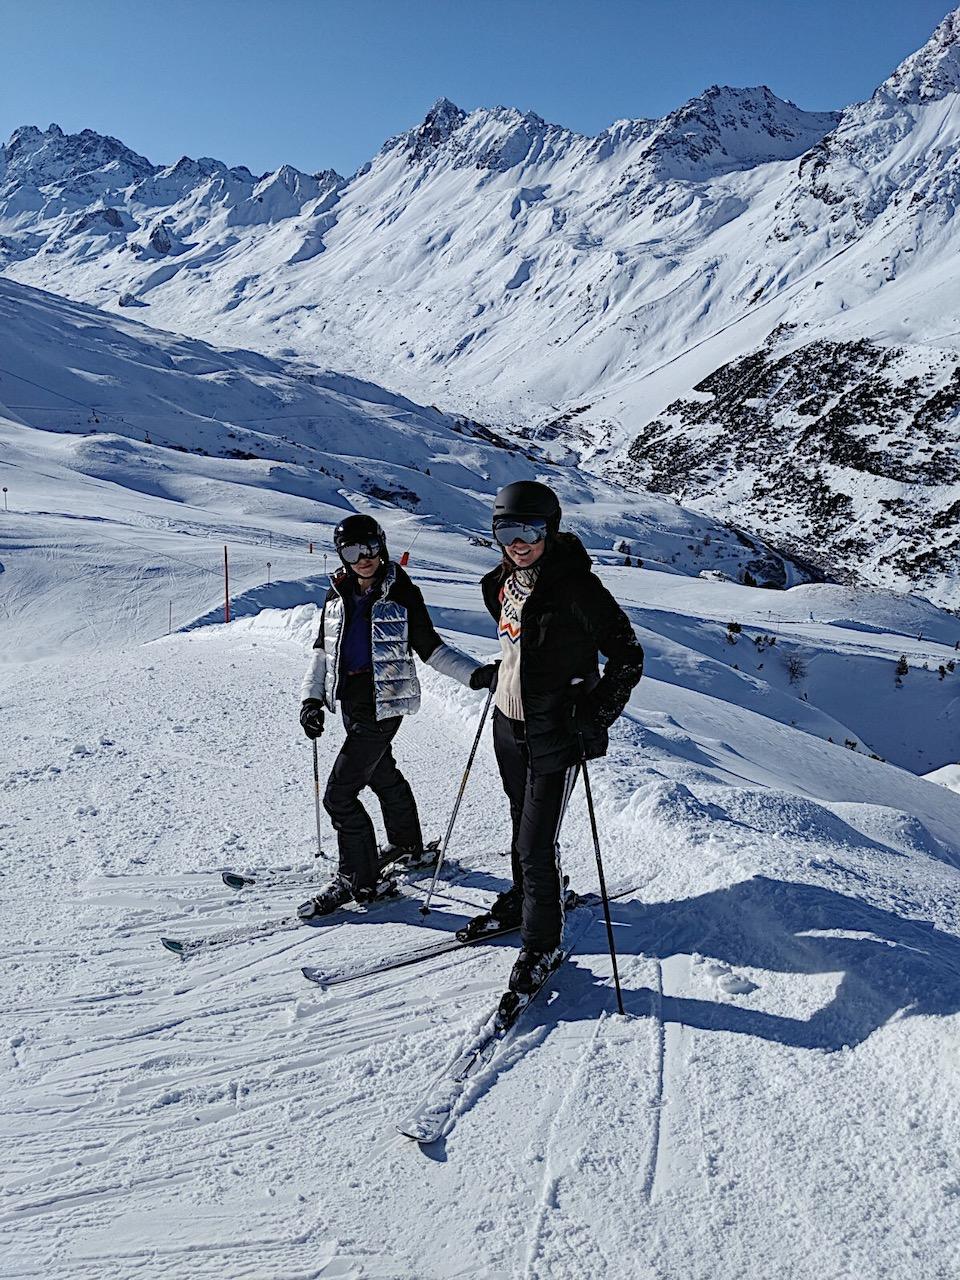 Ischgl ski - wintersport tips - Samnaun - skimap Ischgl - Schhmugglerrunden/ Smuggler's circuits - Amandine Hach - Chloe Sterk